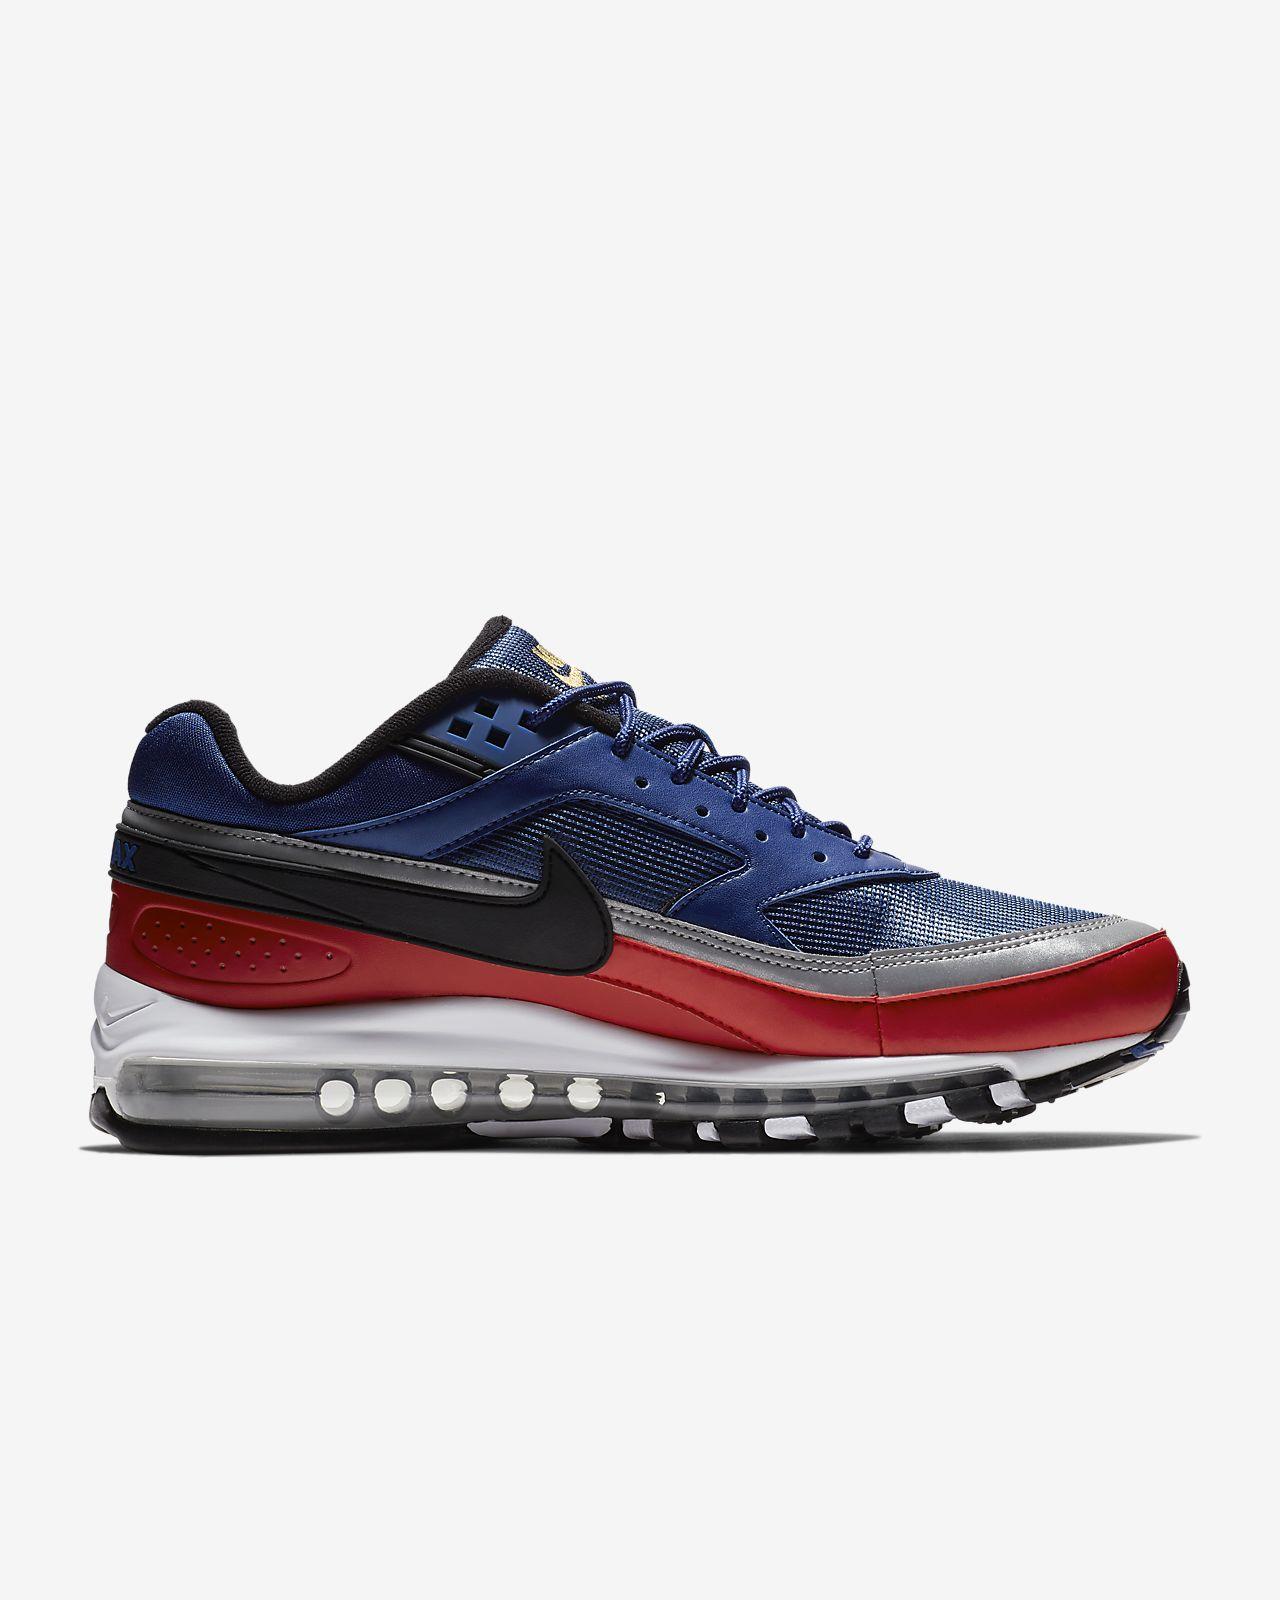 1c7e5444ad8 Chaussure Nike Air Max 97 BW pour Homme. Nike.com FR